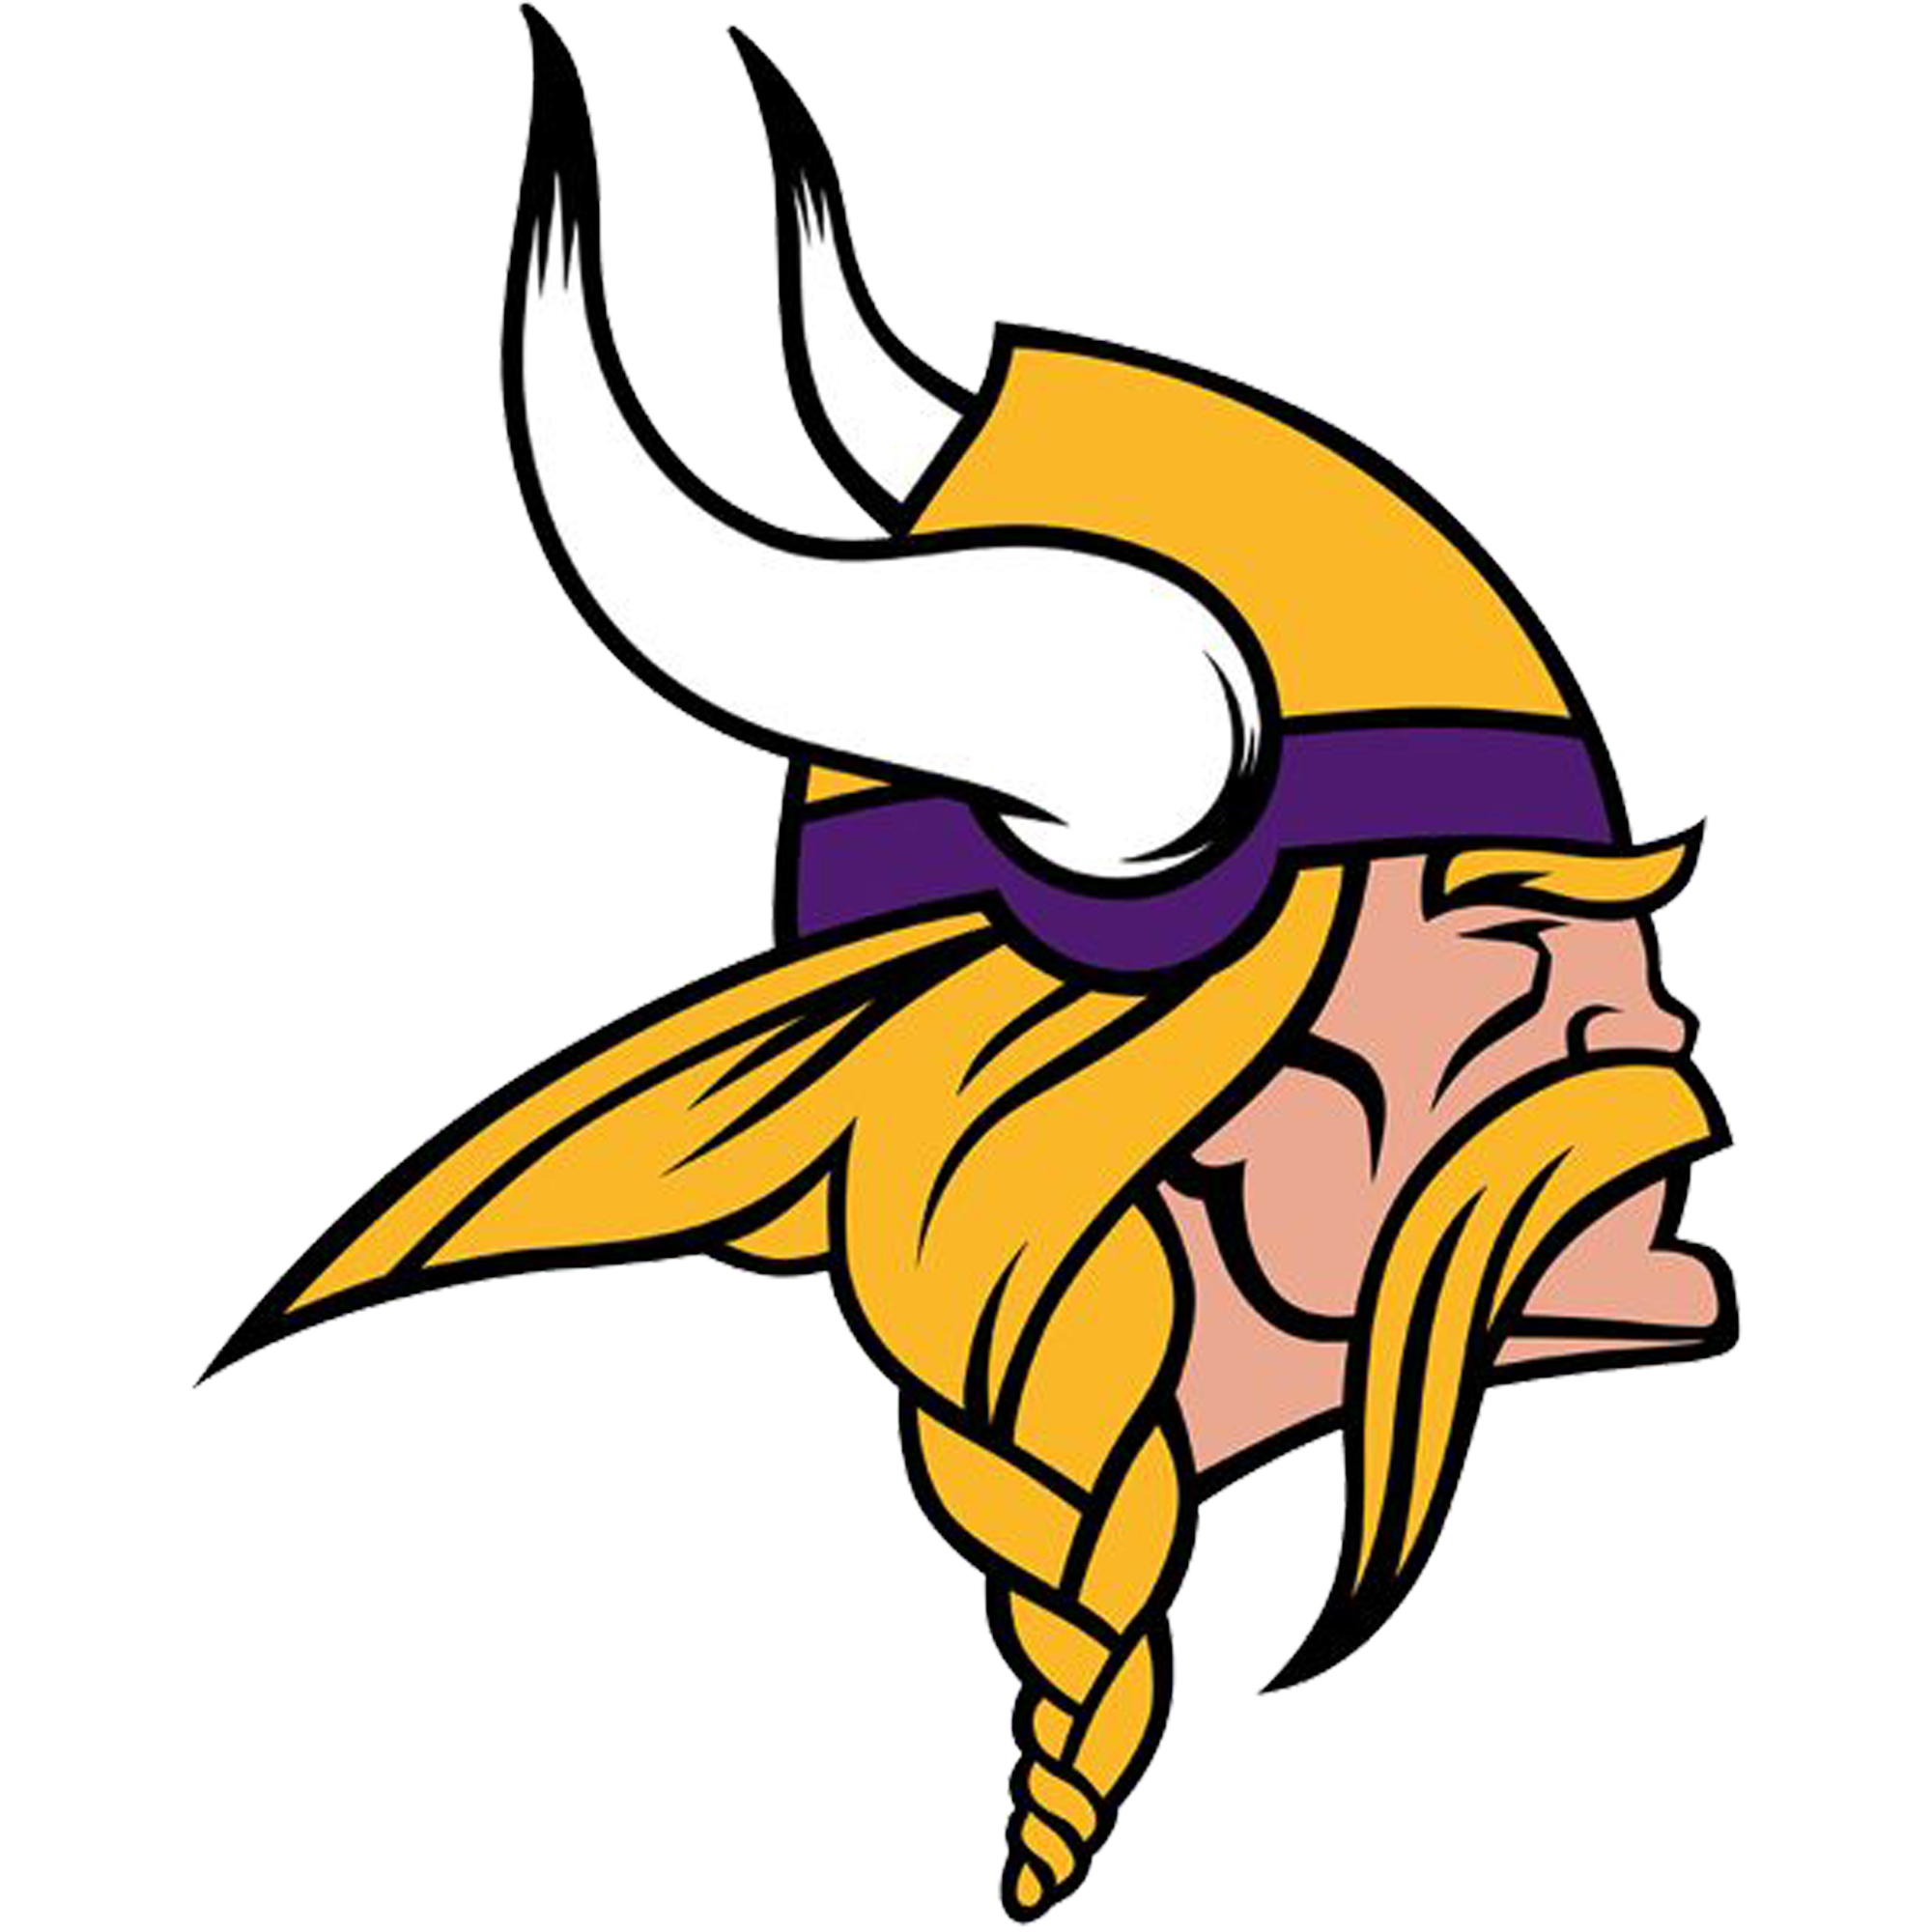 Minnesota Vikings Fathead Logo Giant Removable Decal - No Size